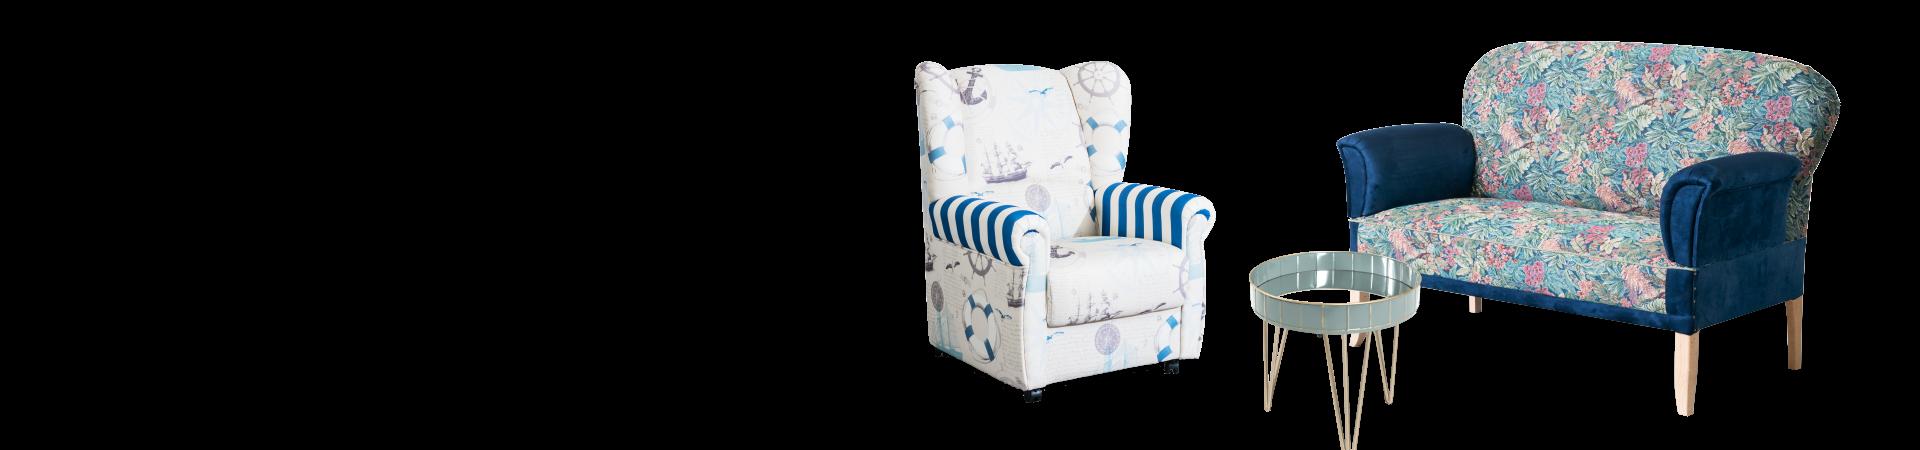 Verschiedene Möbelstücke